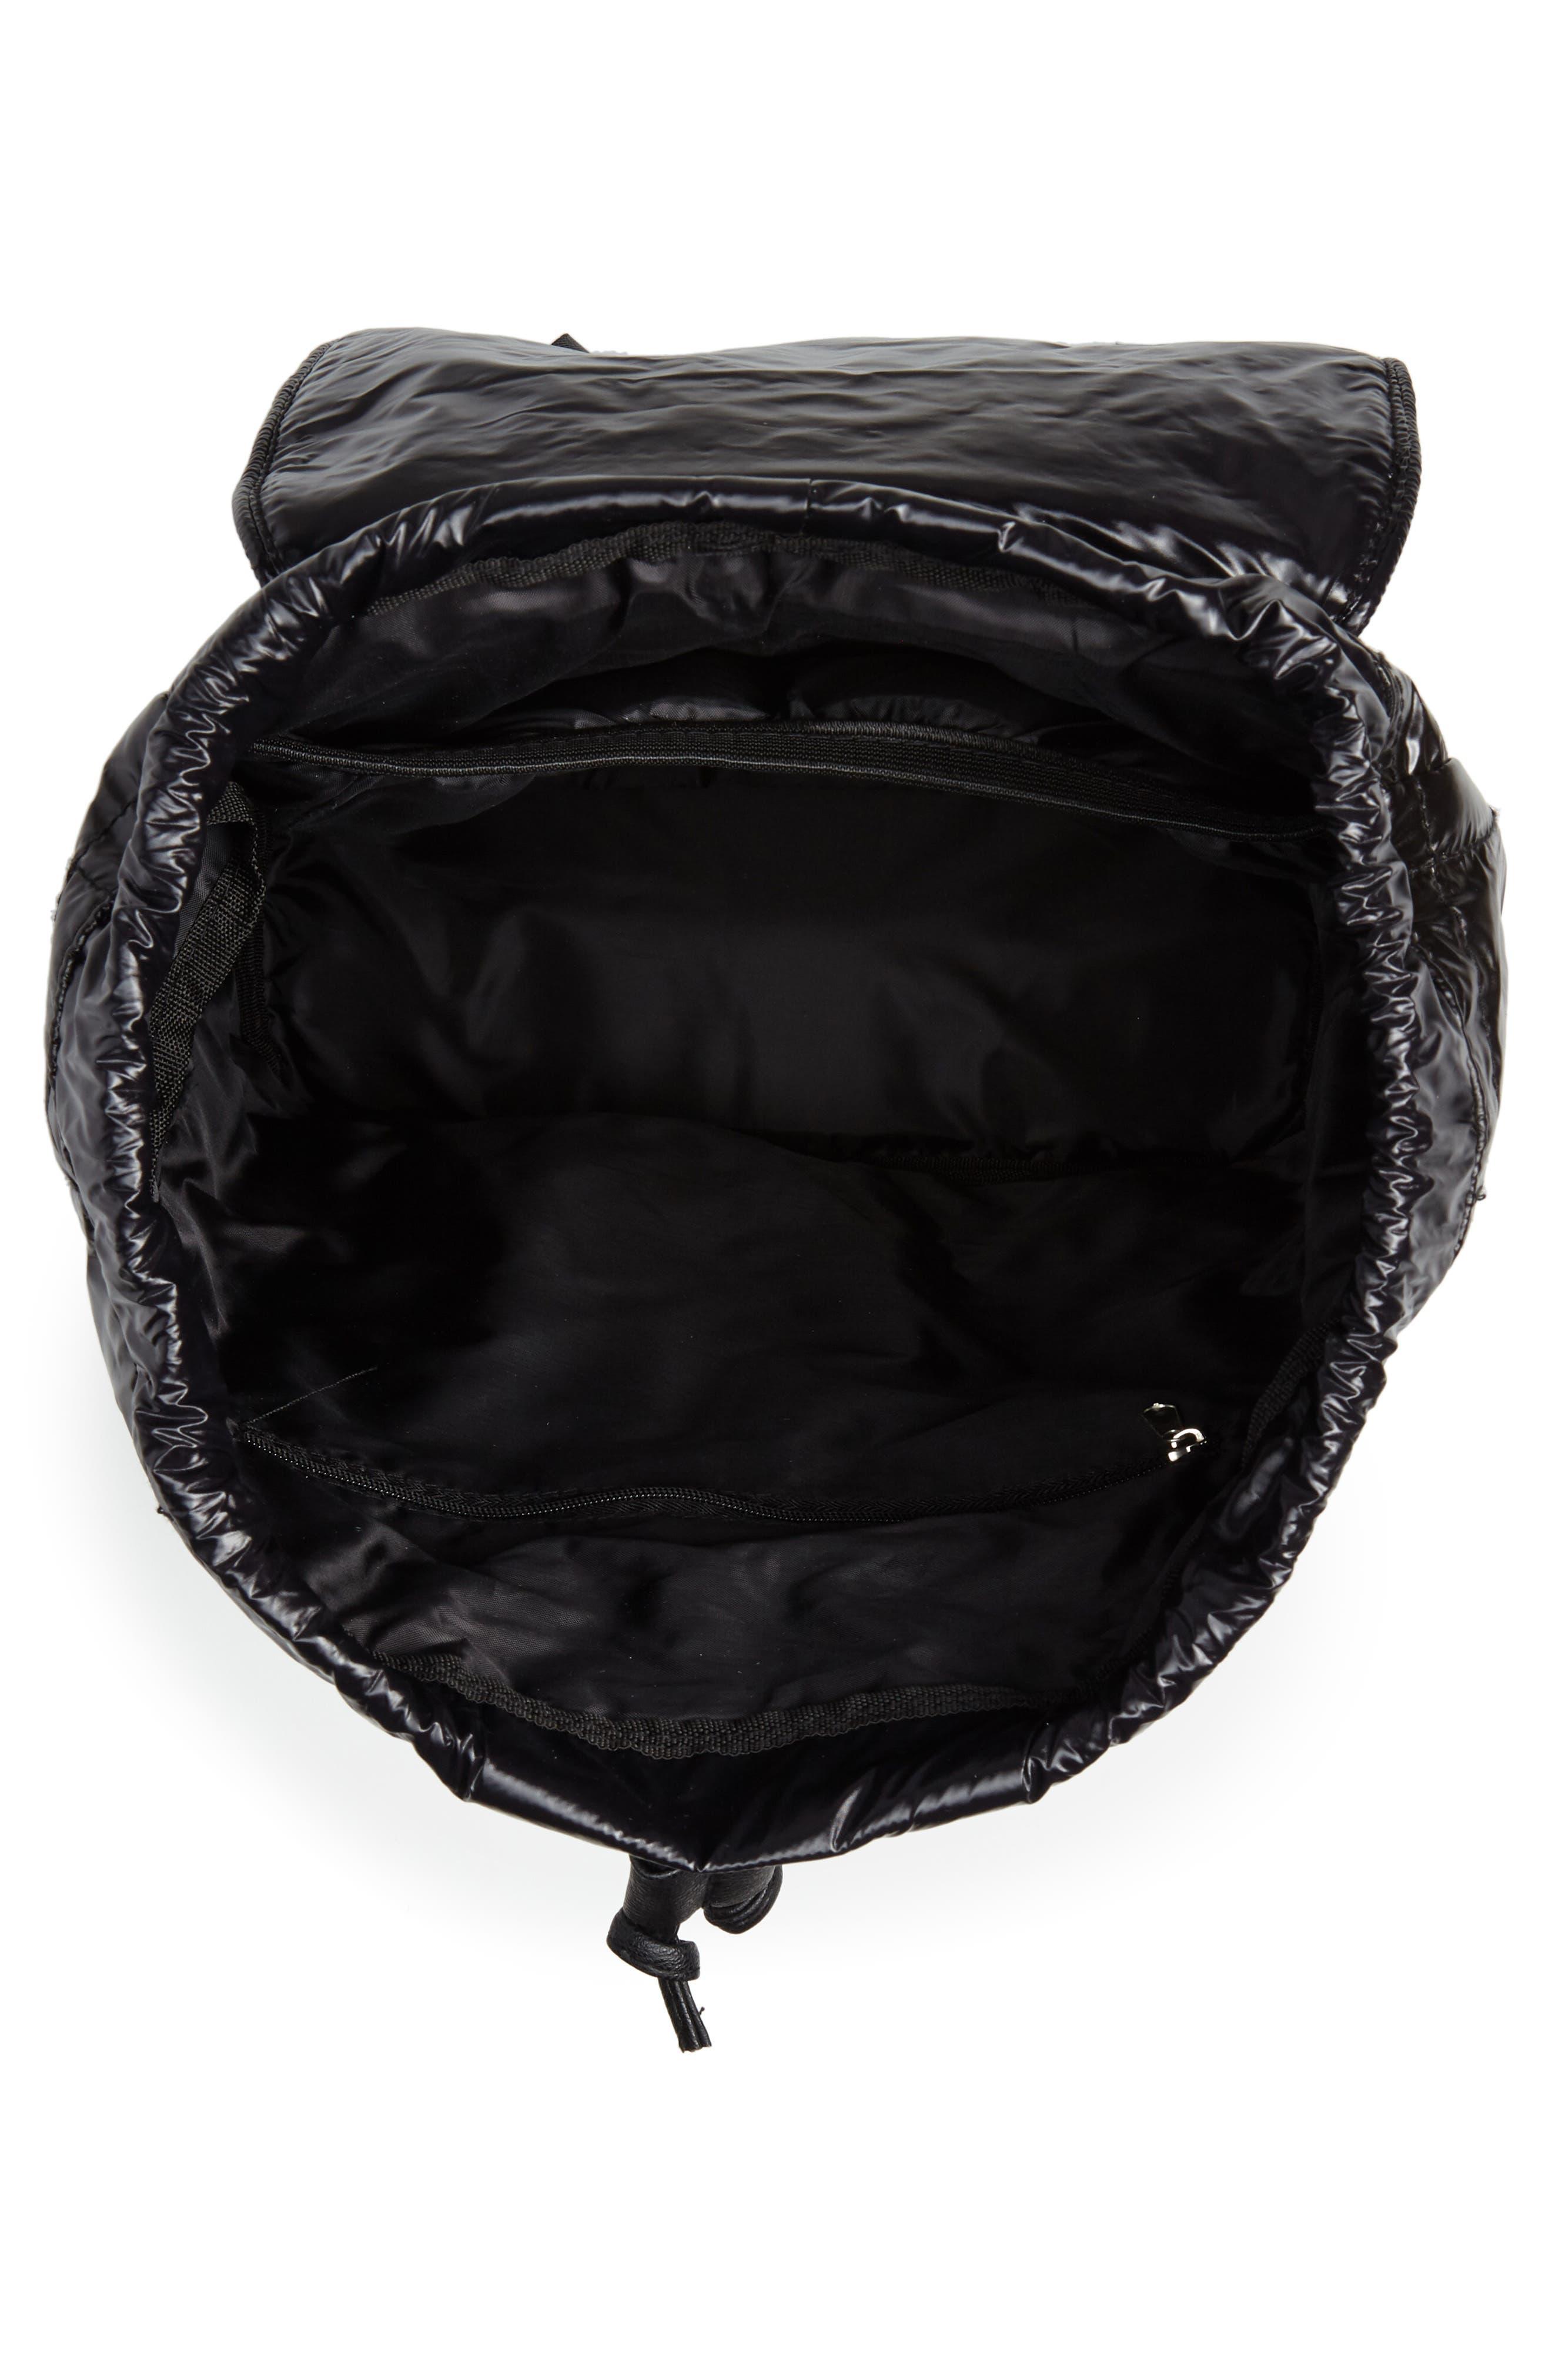 Puffer Backpack,                             Alternate thumbnail 4, color,                             001